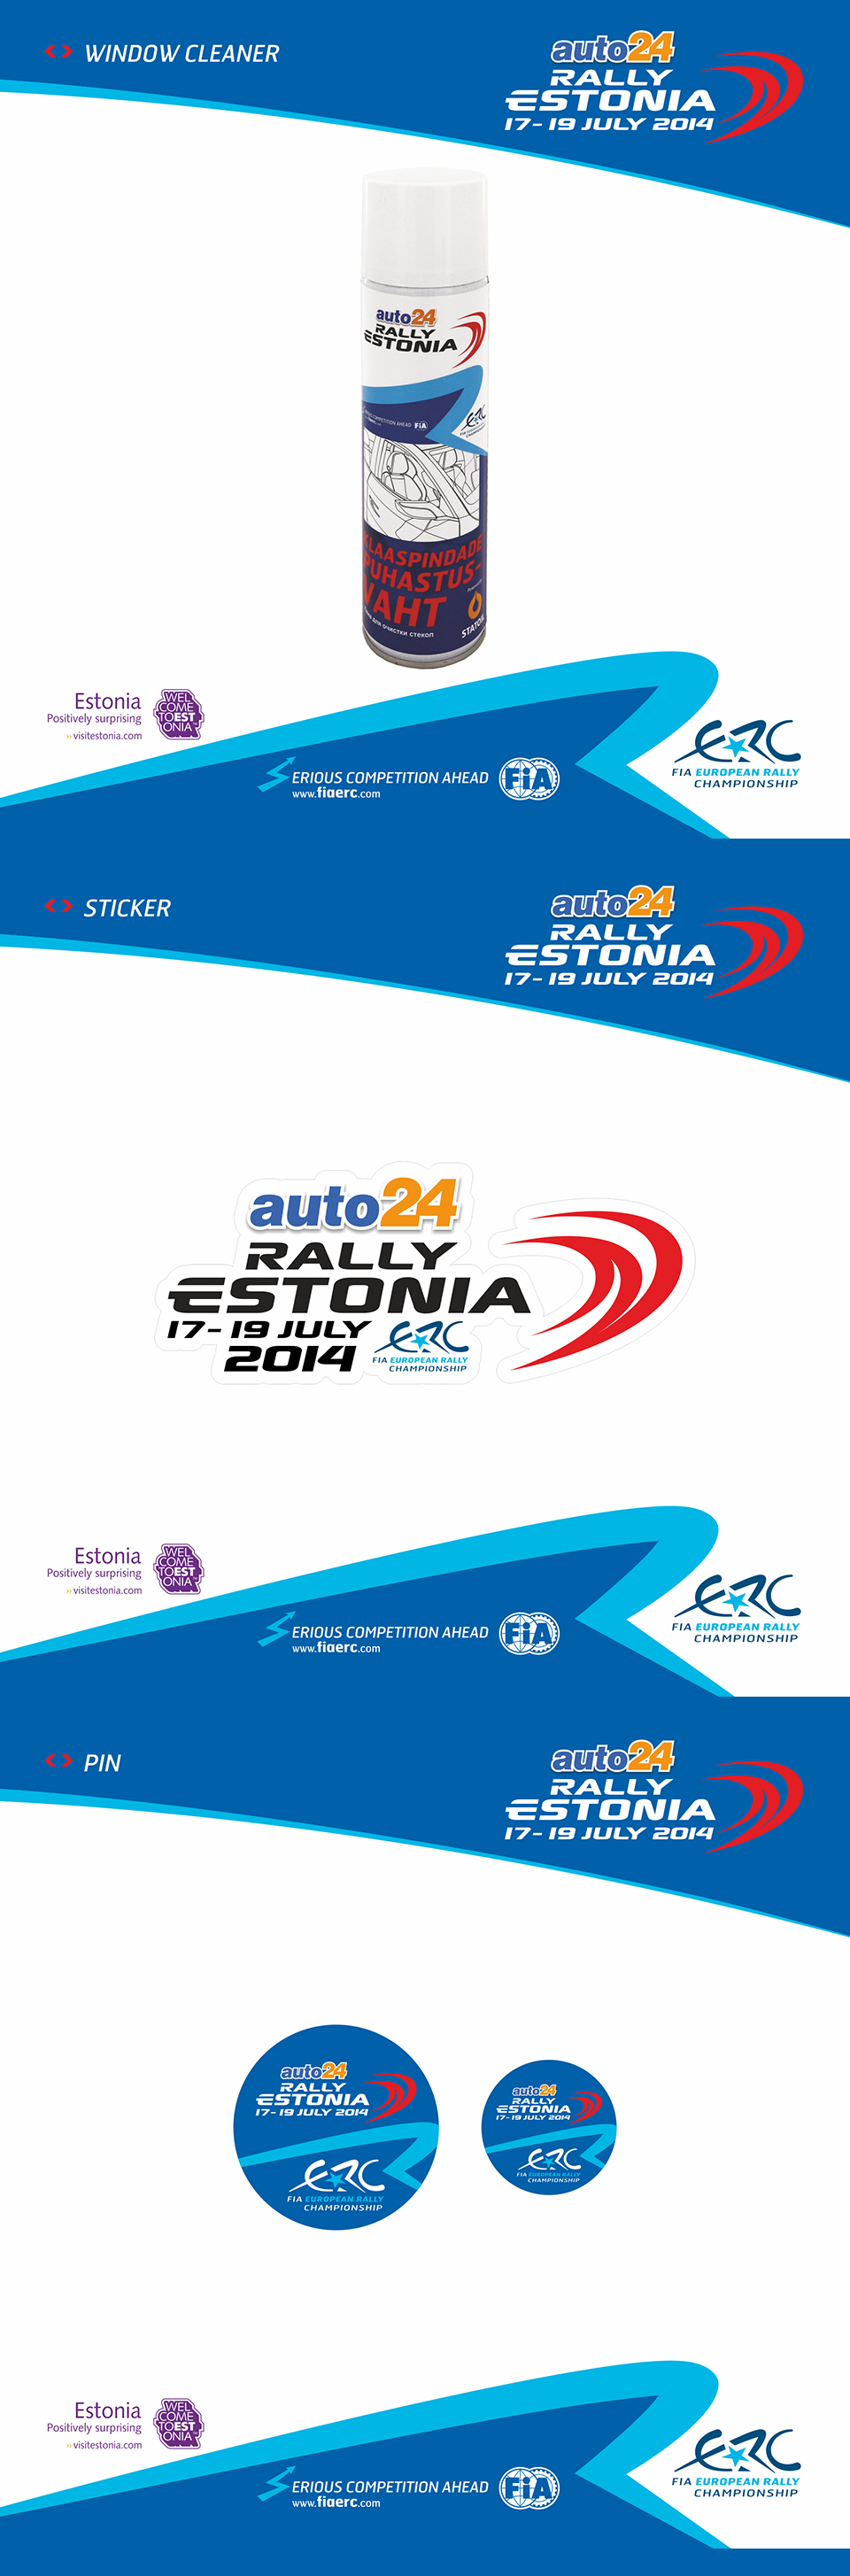 RallyEstonia-23